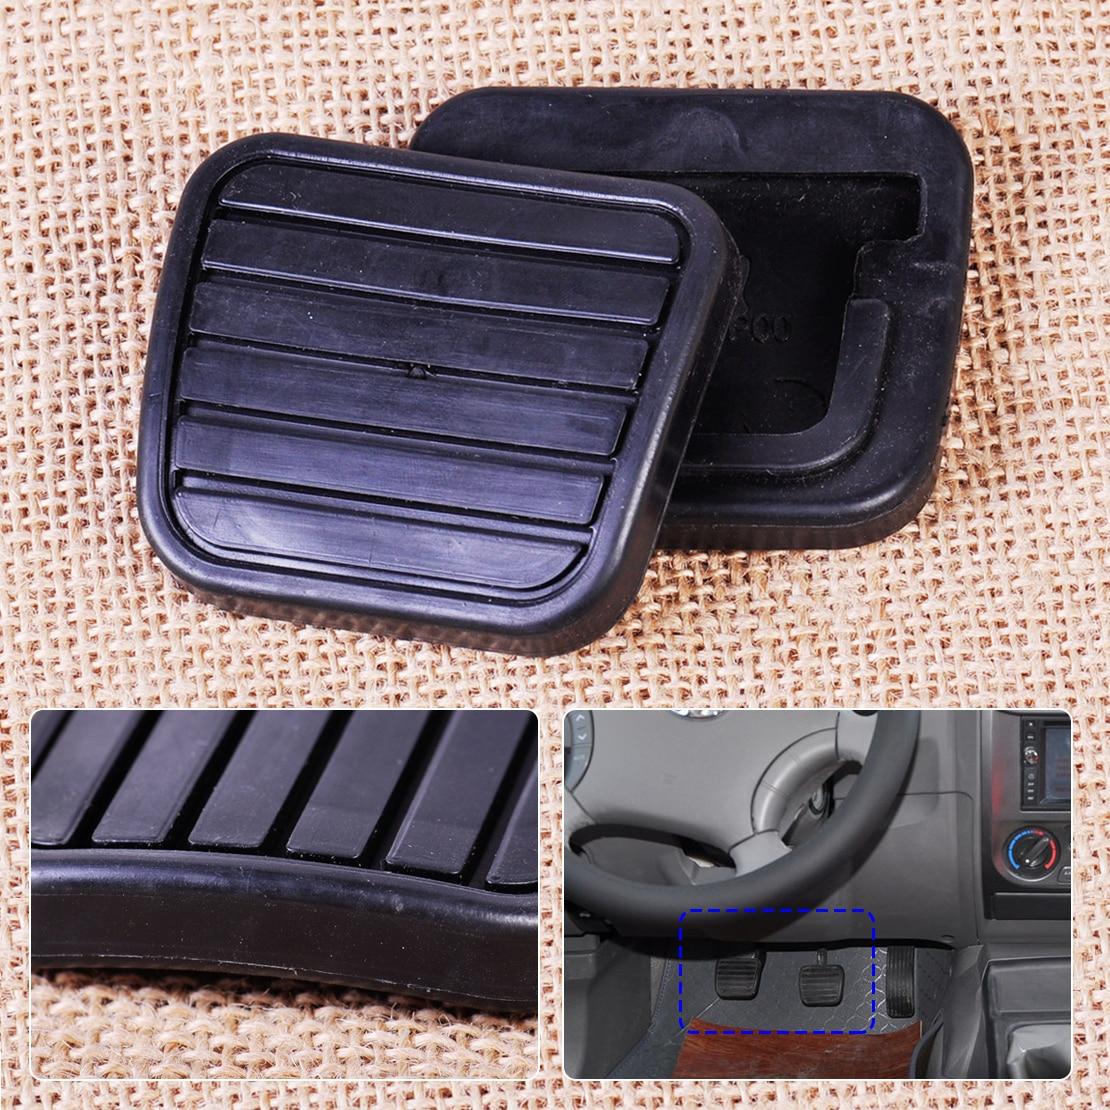 CITALL 2pcs Car Clutch Brake Pedal Pad Rubber Cover For Great Wall V200 K2 2.0L Man Dual Cab PickUp RWD 2012 2013 2014 2015 2016